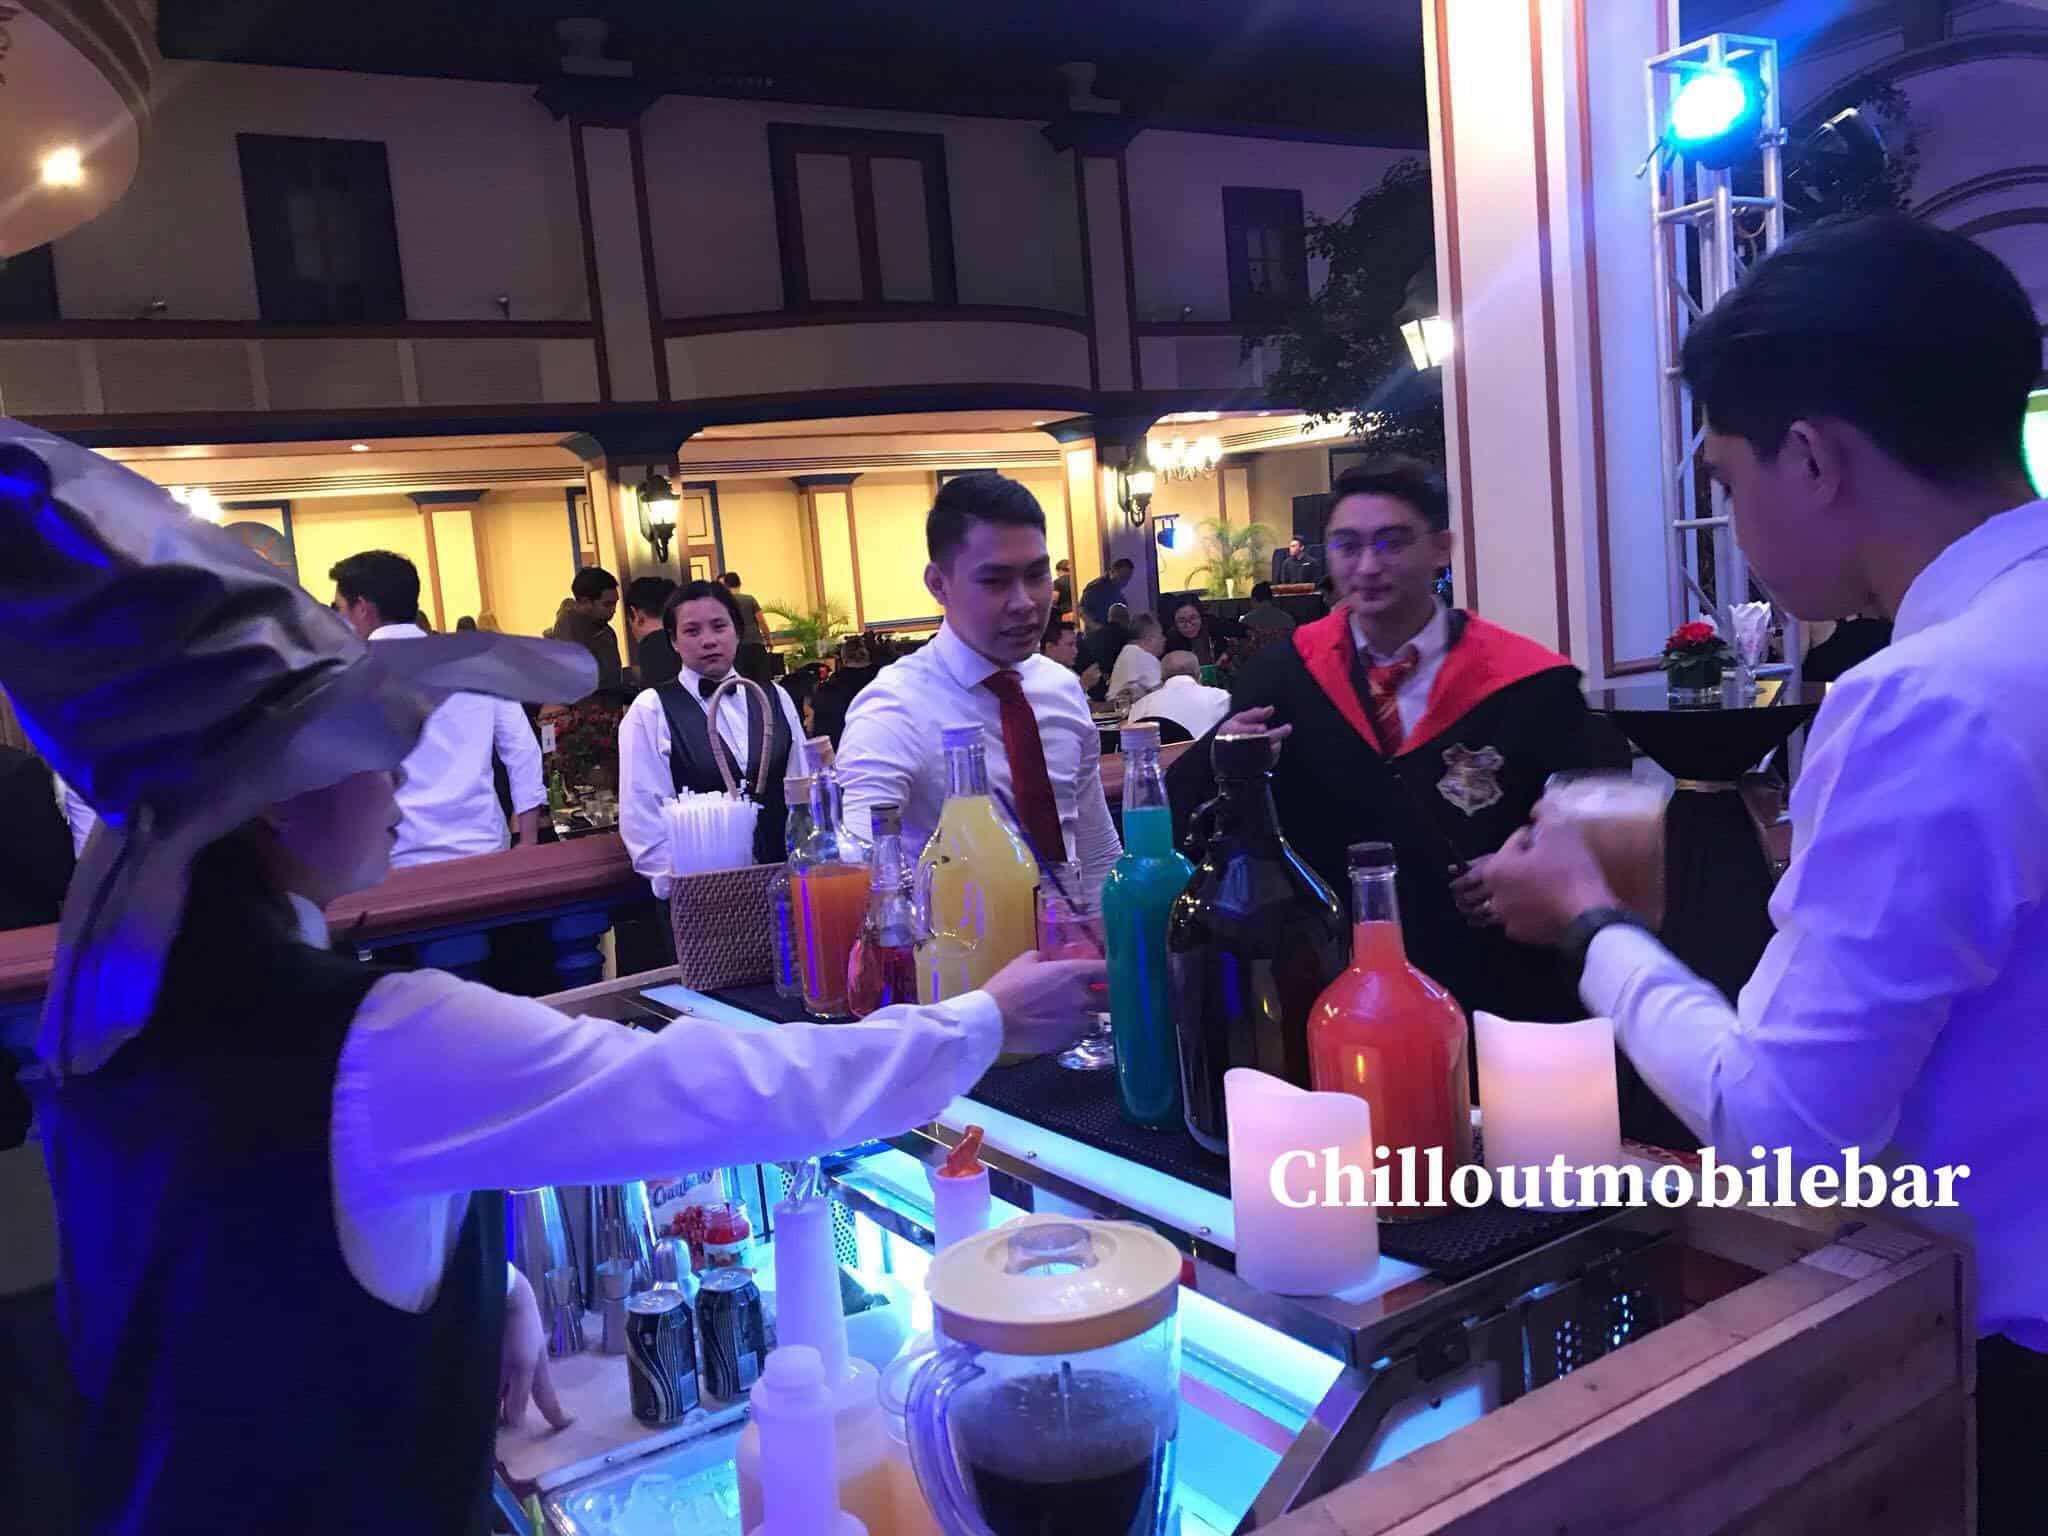 Chillout Mobile Bar Cebu Cocktails Services (1)